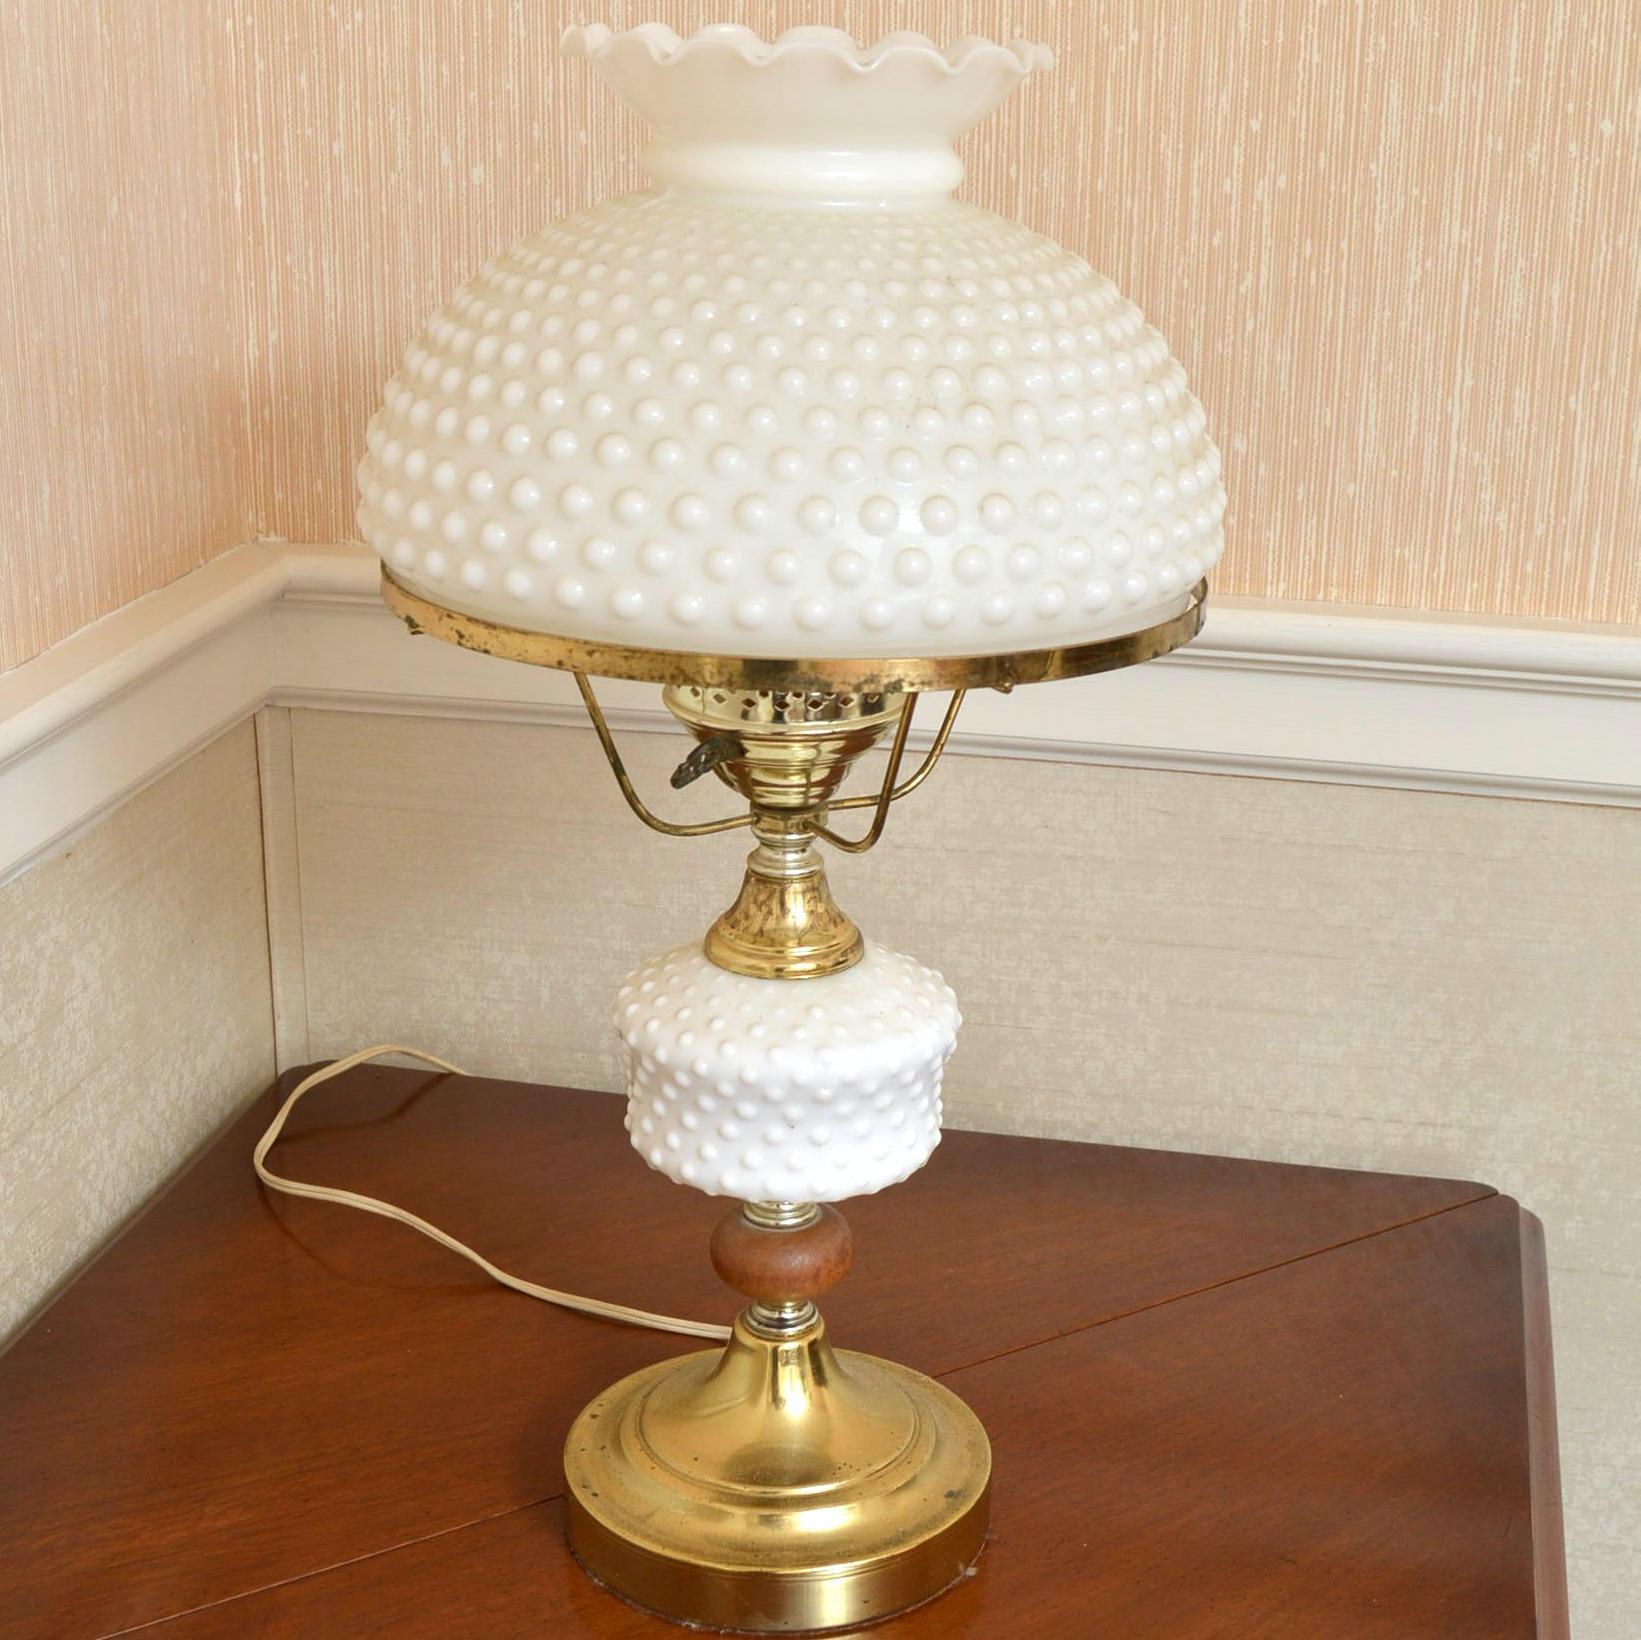 Hobnail Milk Glass Parlor Lamp